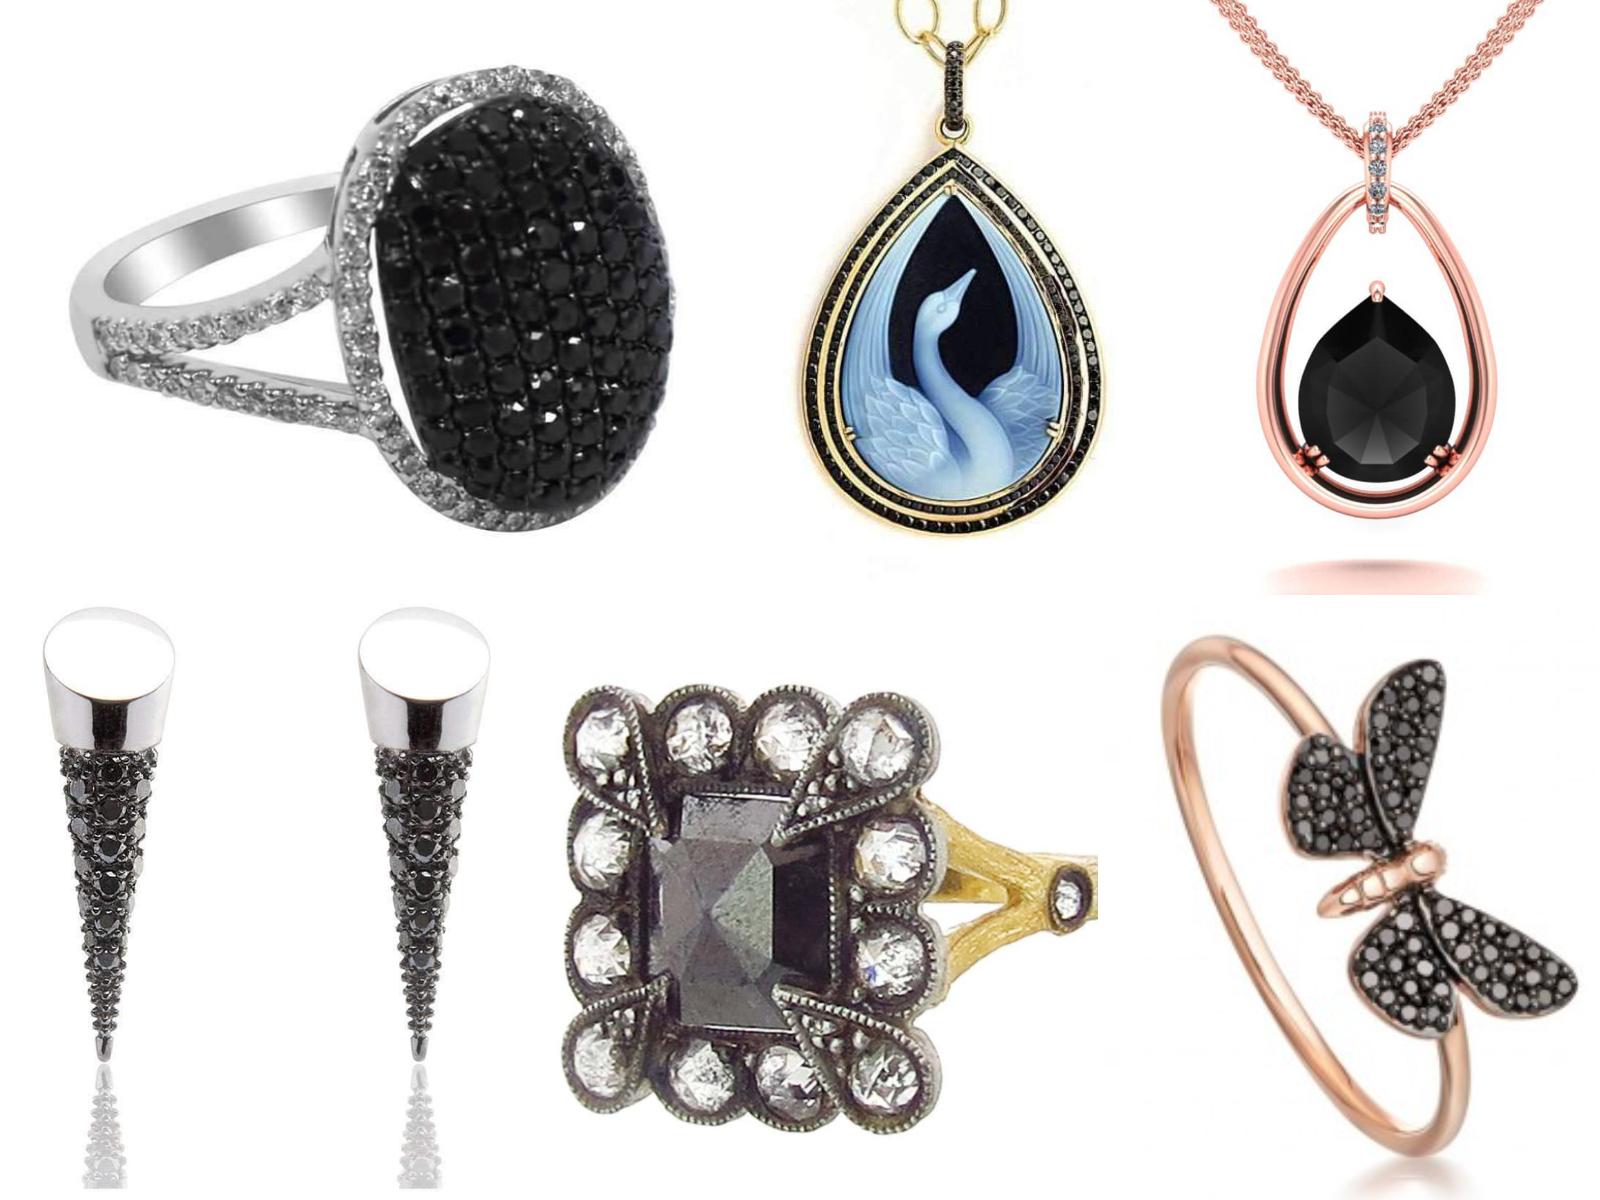 210e93e91 From left to right: Black Diamond Oval Silver Ring, Blue Swan Black Diamond  Pendant, Rose Gold and black Diamond Pendant, Black Diamond Moth Rose Gold  Ring, ...